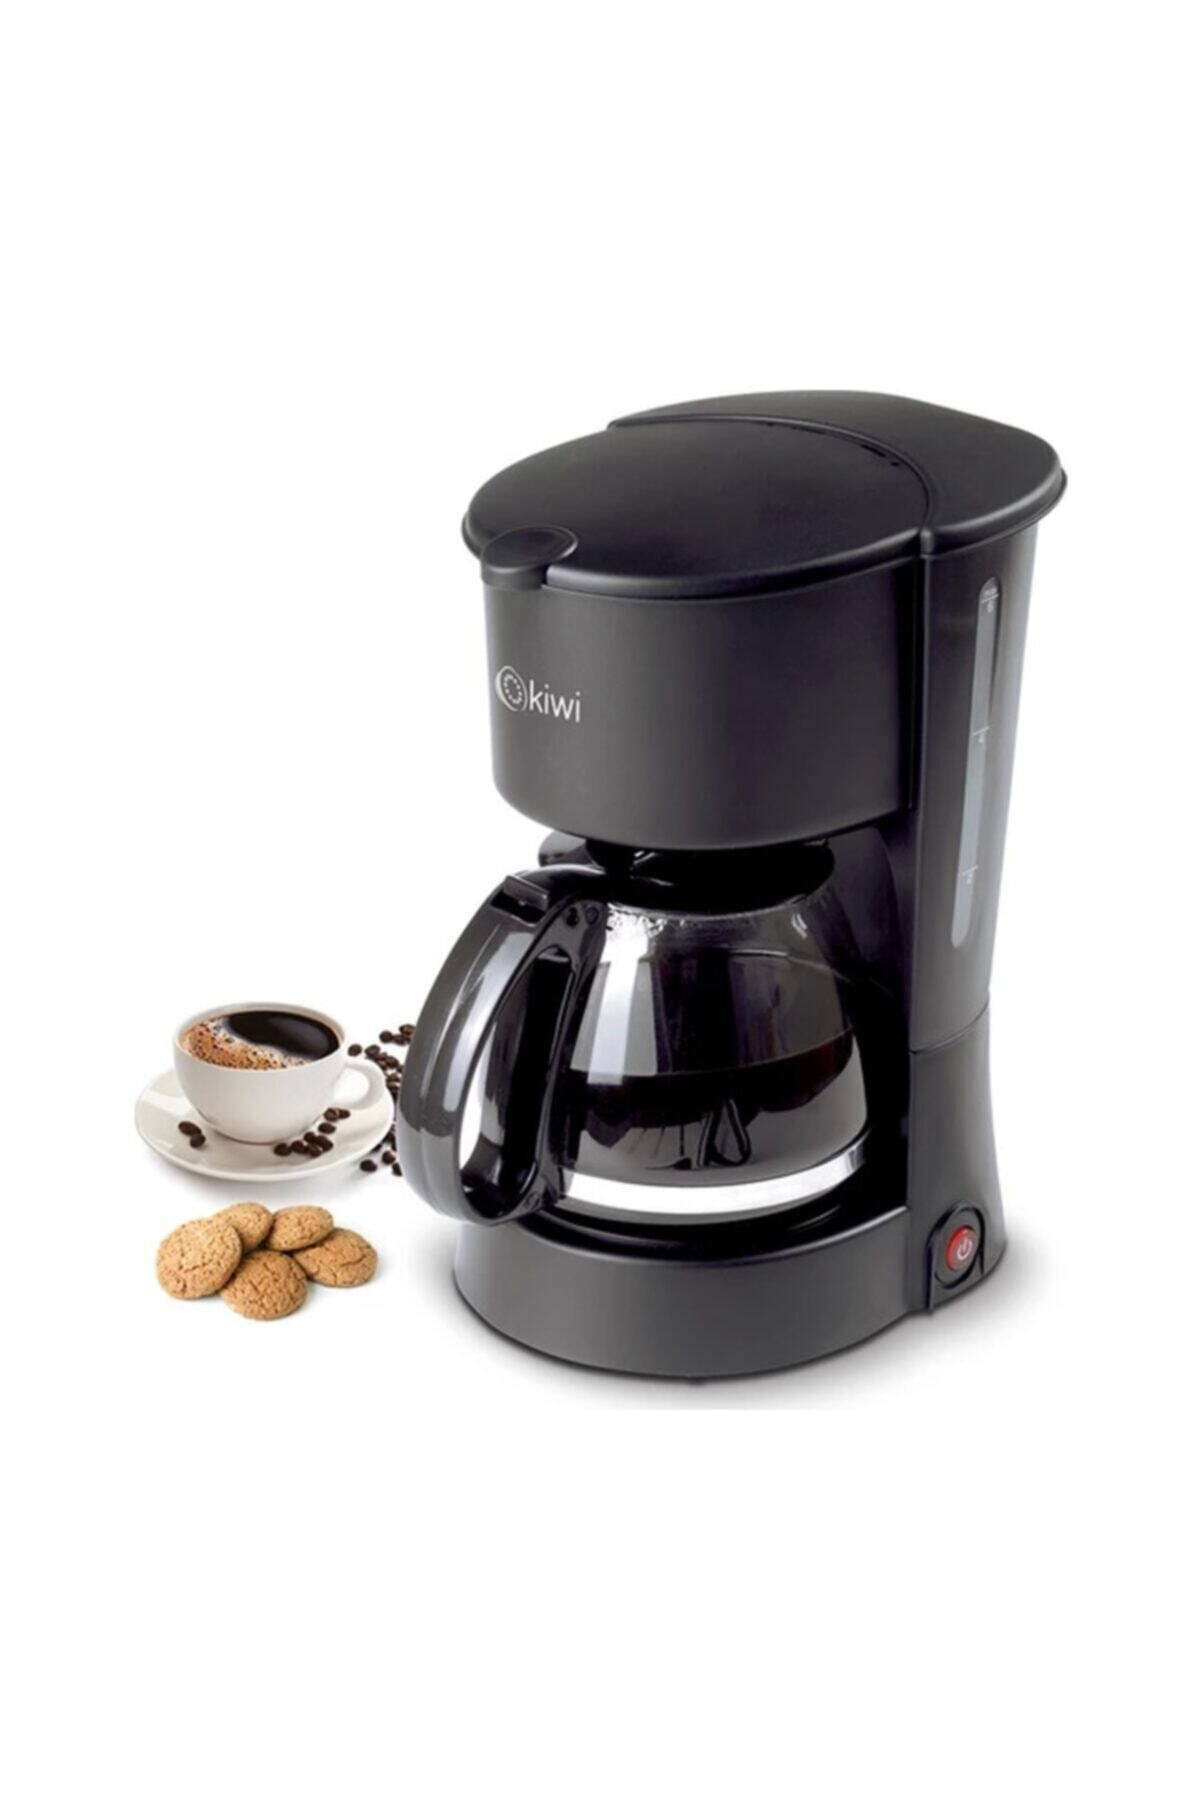 Kiwi Kcm-7535 Filtre Kahve Makinesi 1